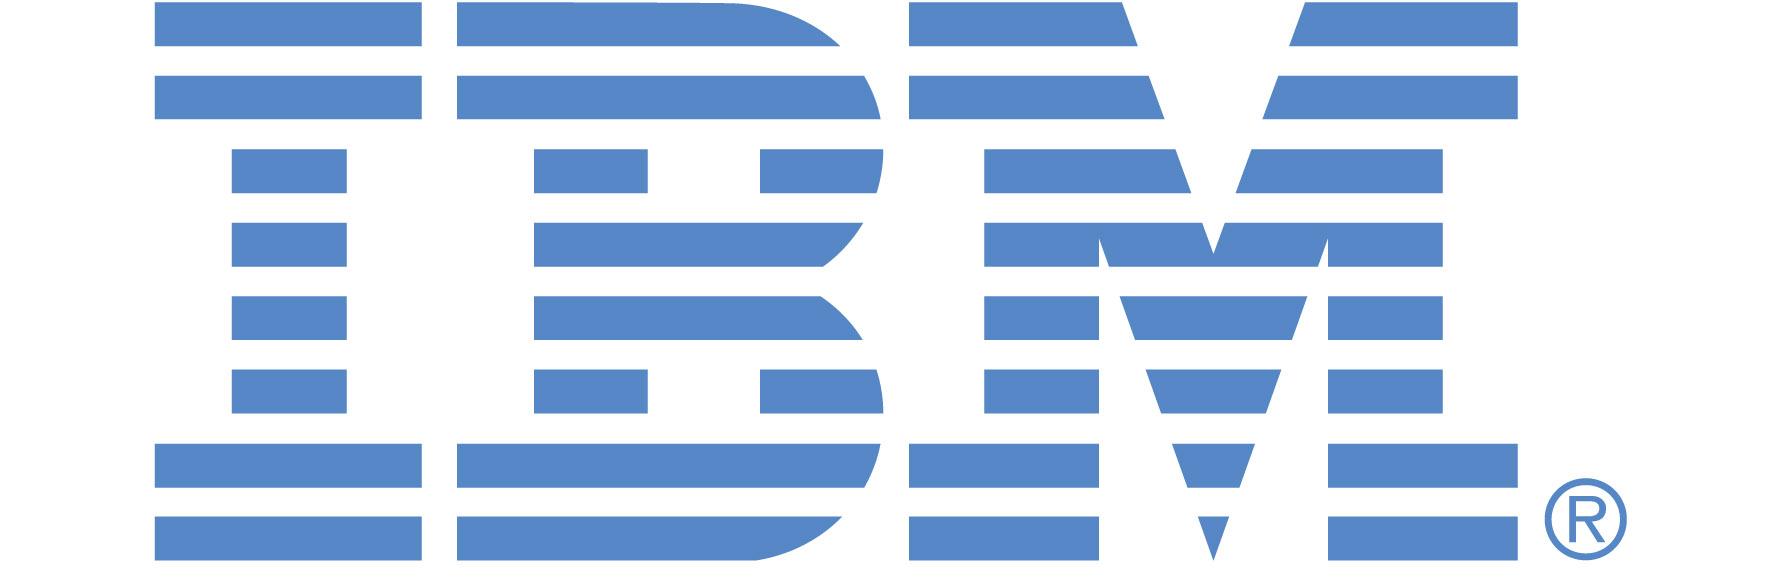 IBM azul_ alta